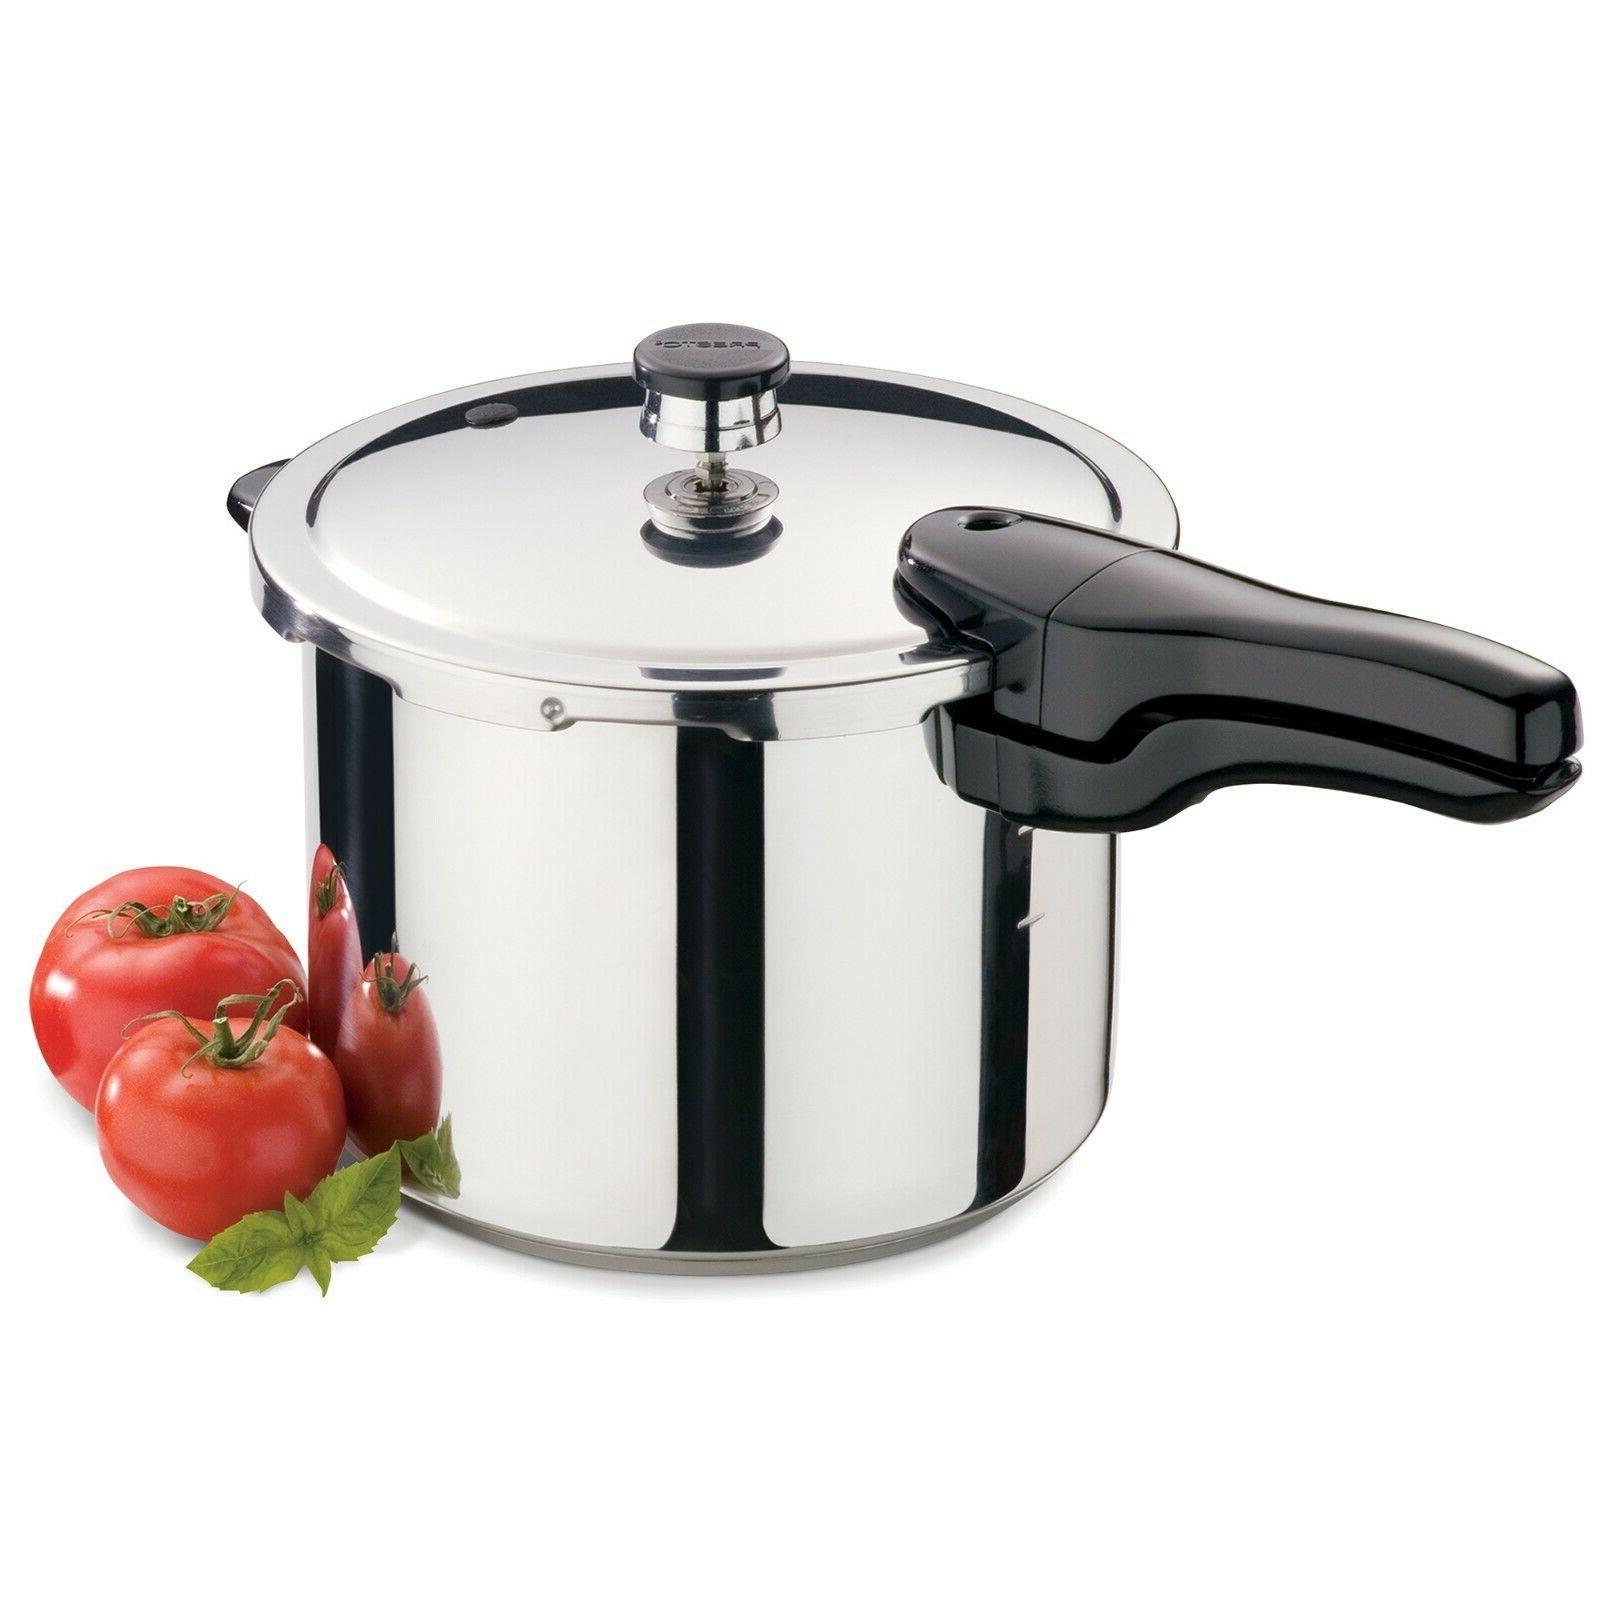 6 quart stainless steel pressure cooker 01362